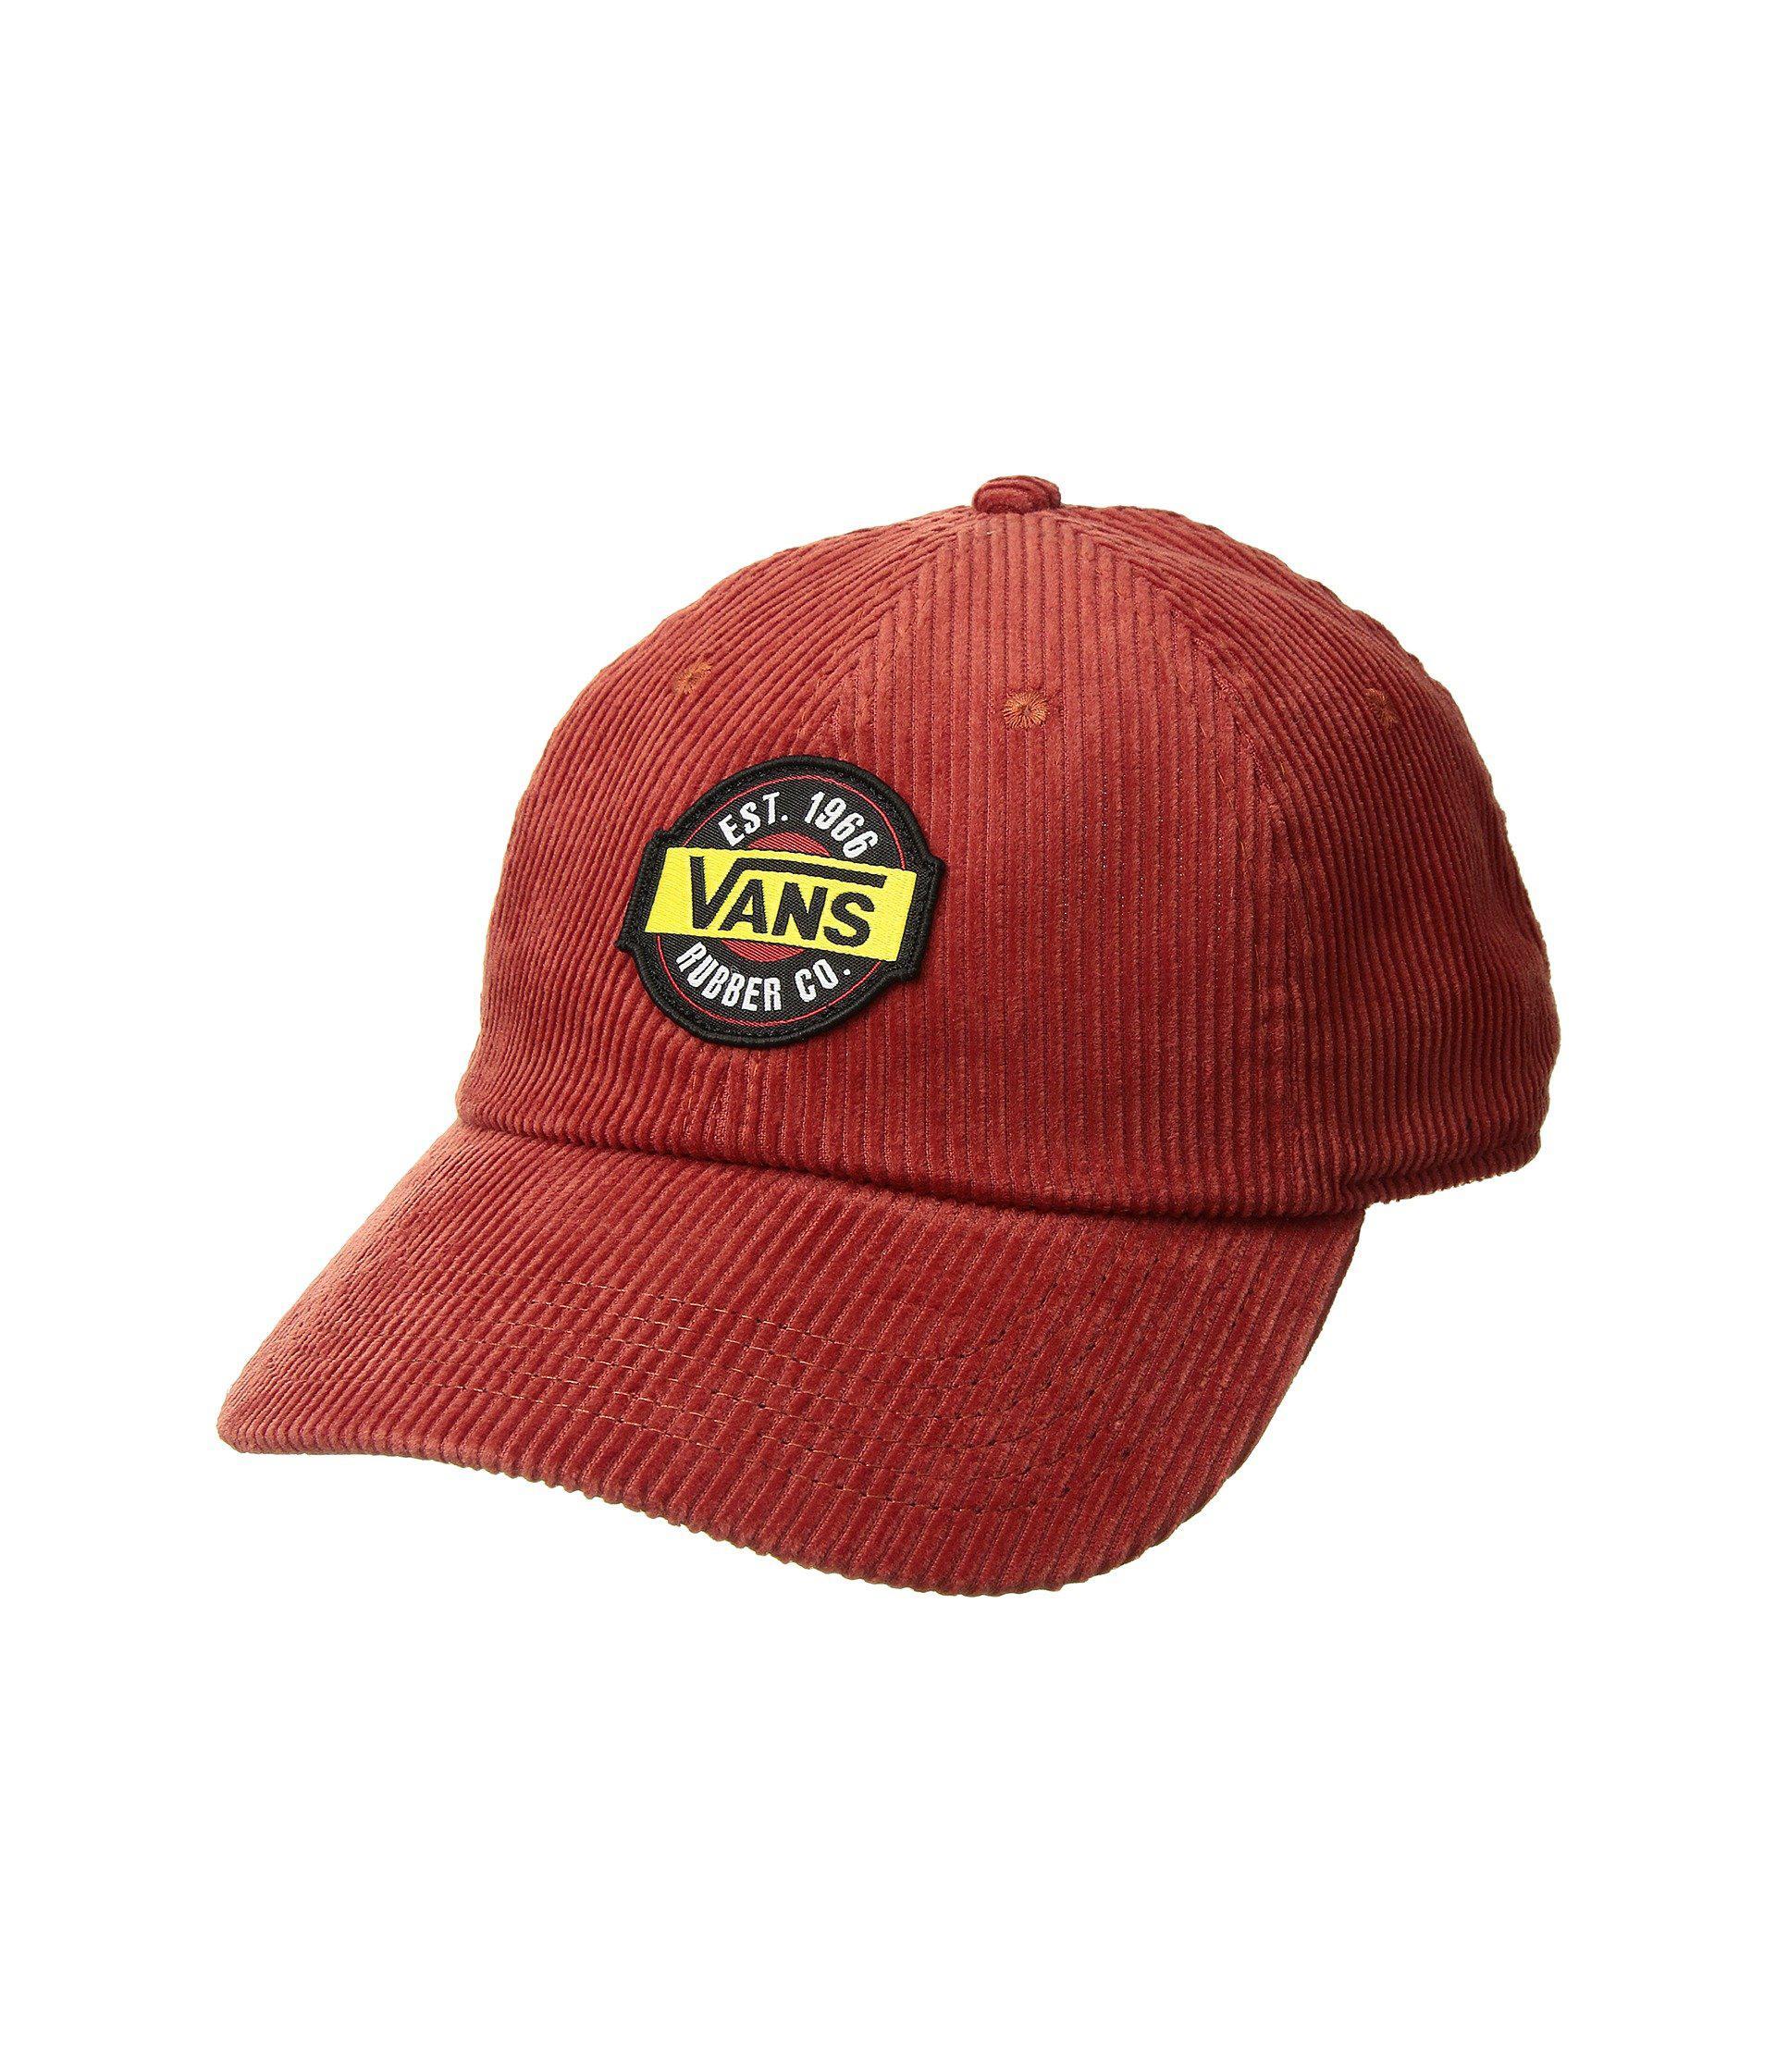 85770c15c39 Vans - Red Summit Court Side Hat (black) Baseball Caps - Lyst. View  fullscreen